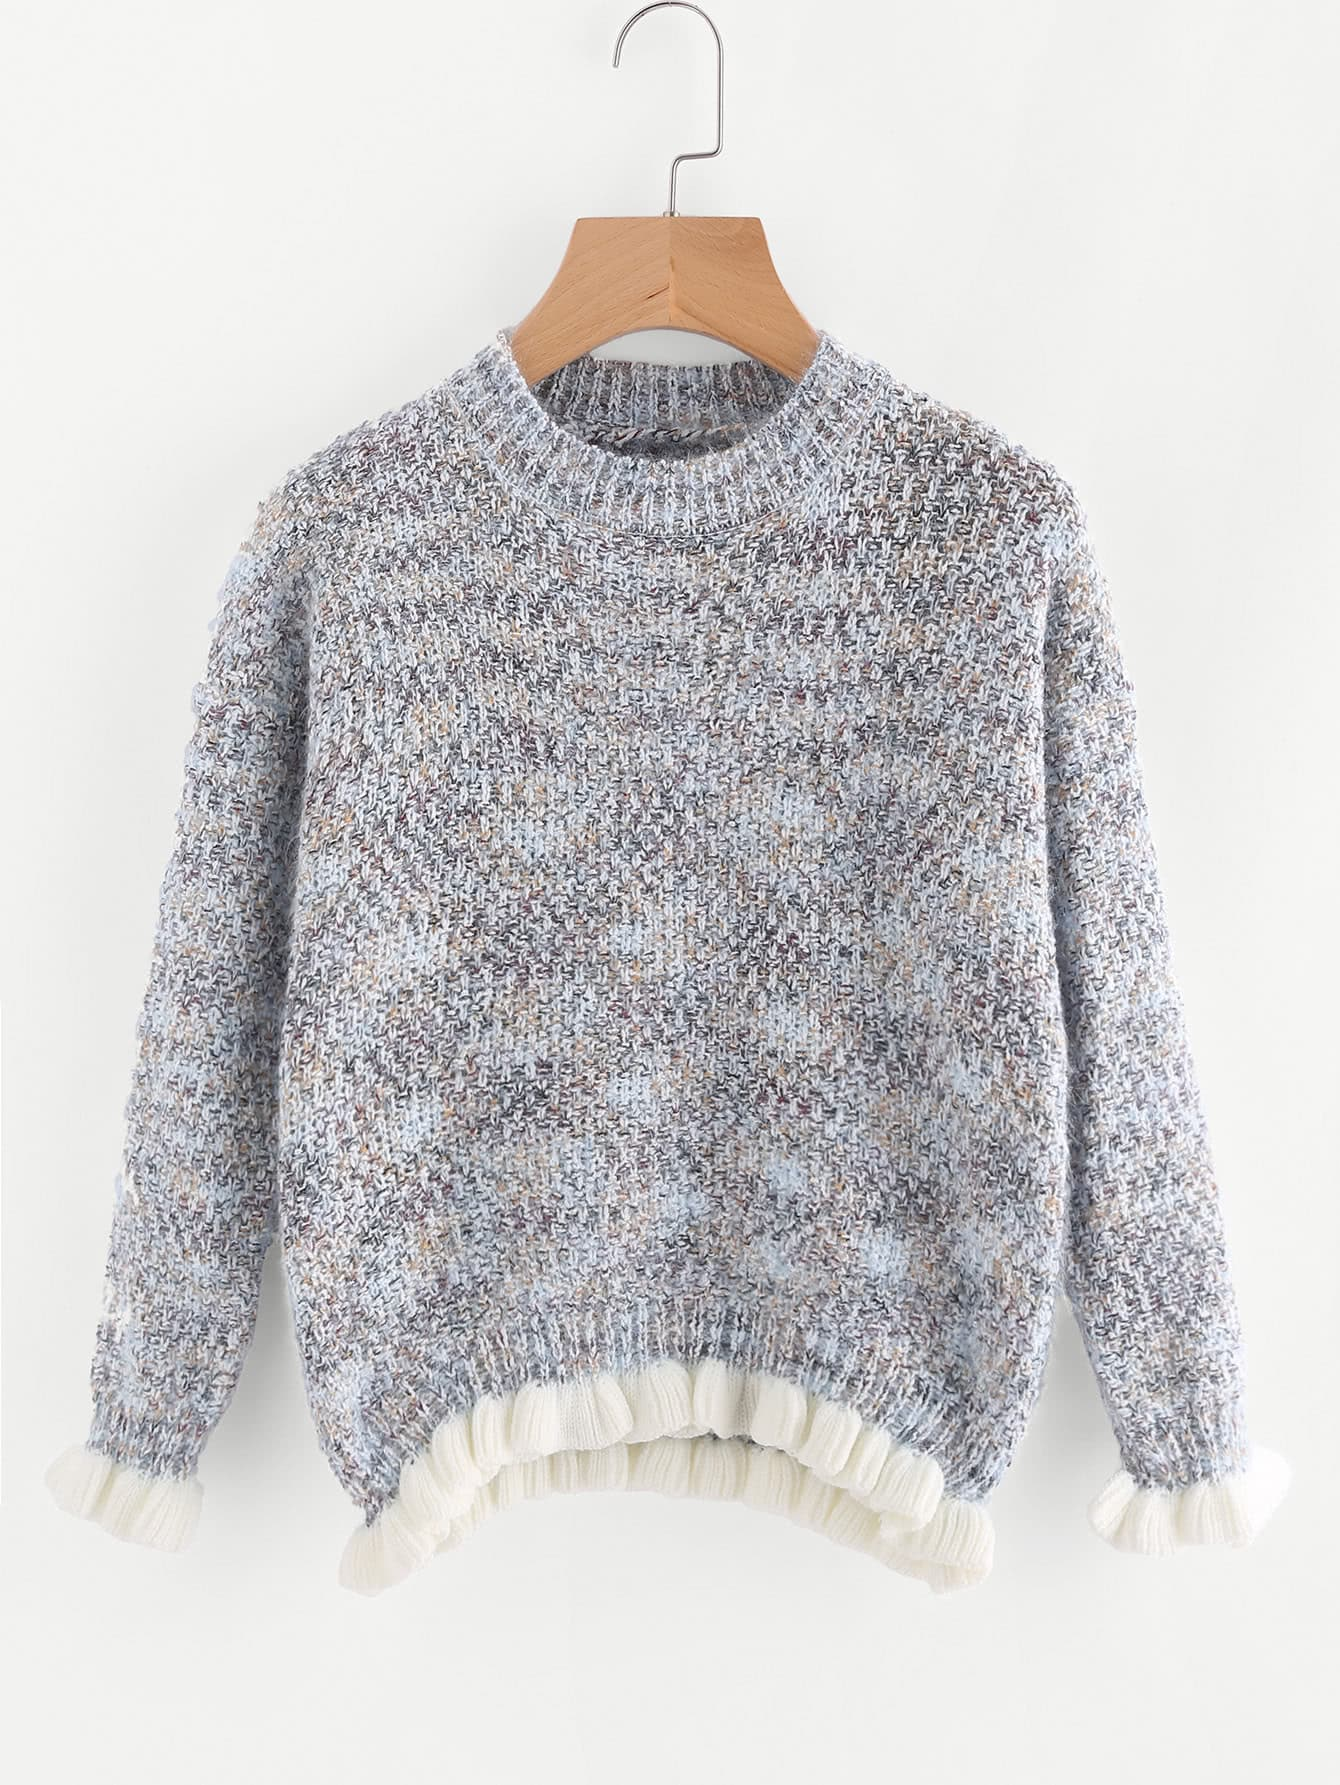 Contrast Frill Trim Slub Sweater